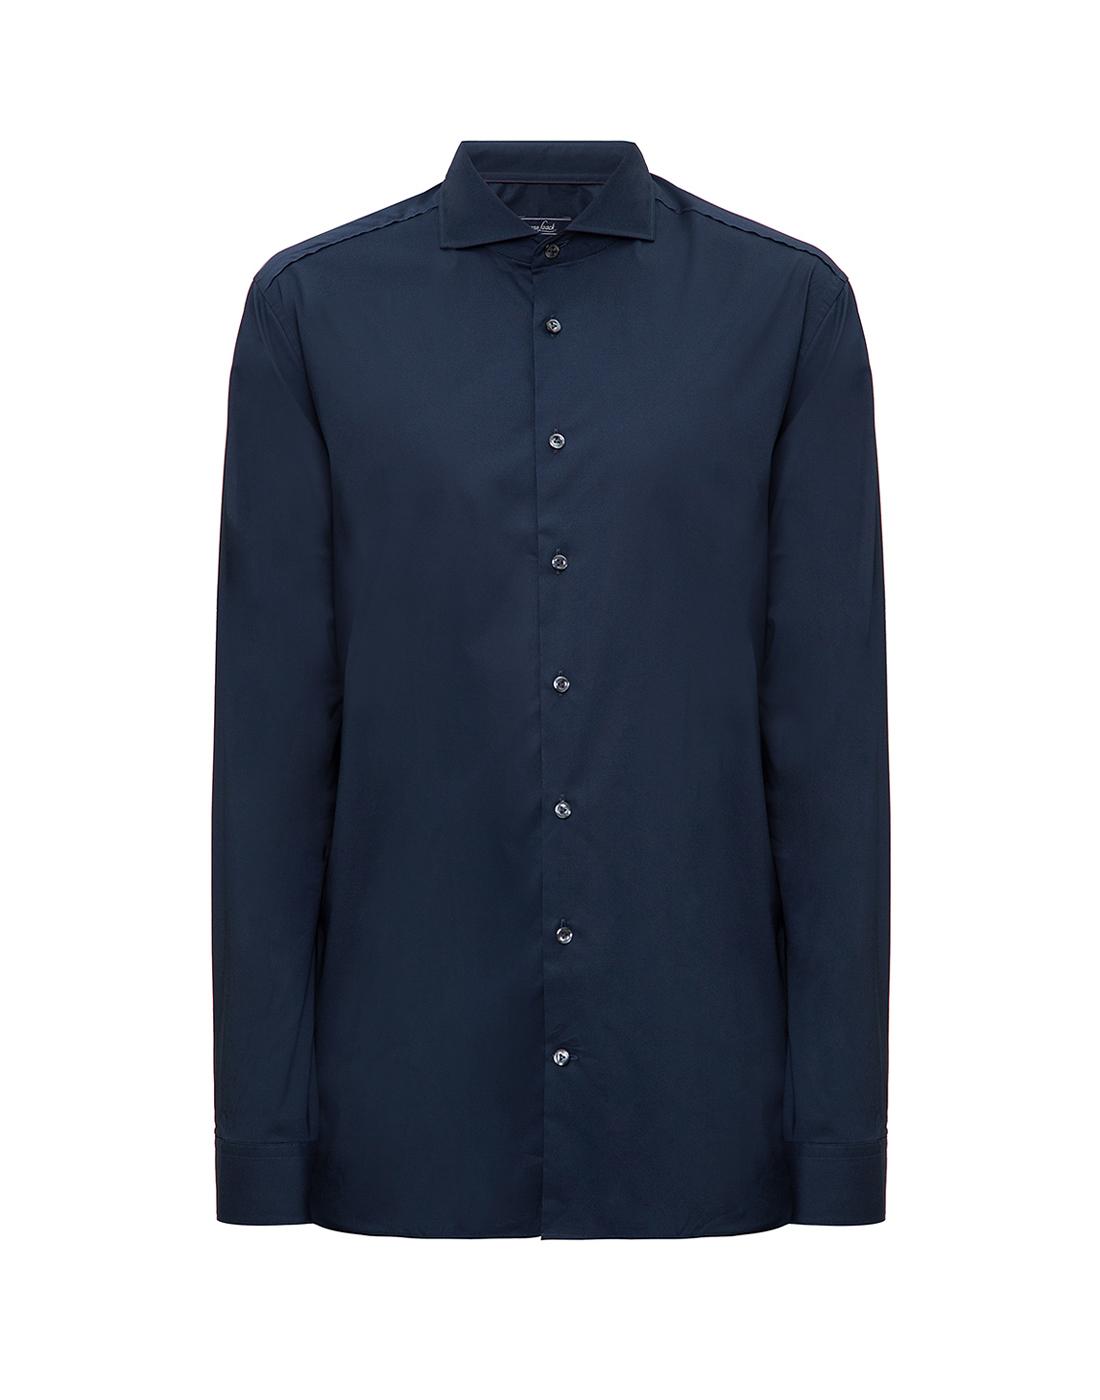 Мужская темно-синяя рубашка Van Laack S130050/790-1